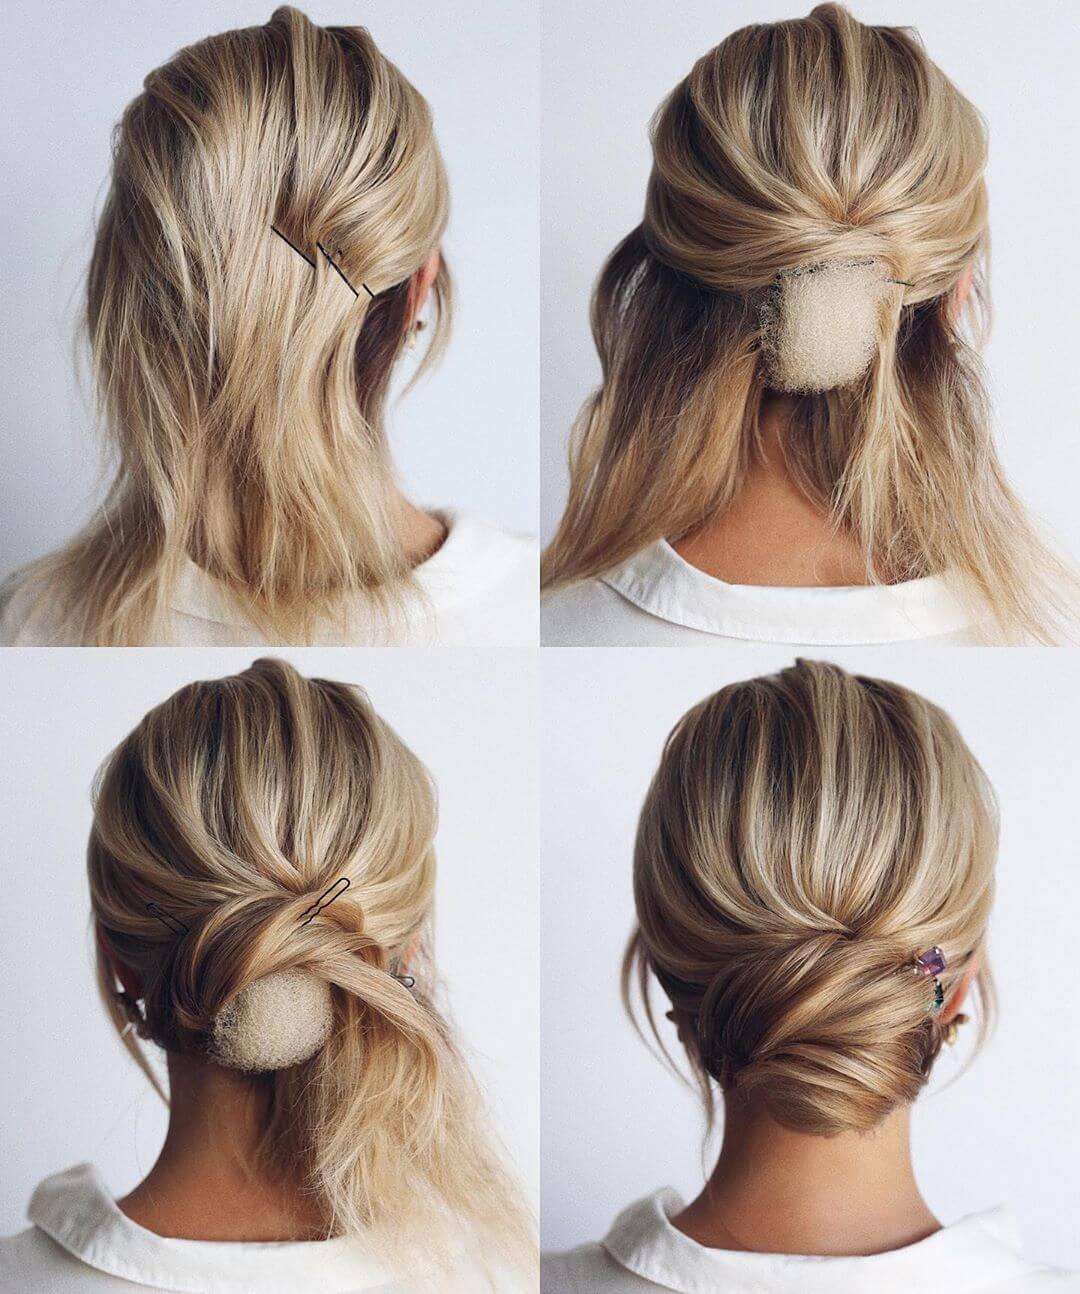 Step by Step Lower bridal bun Hairstyles for Long, Medium, Short Hair